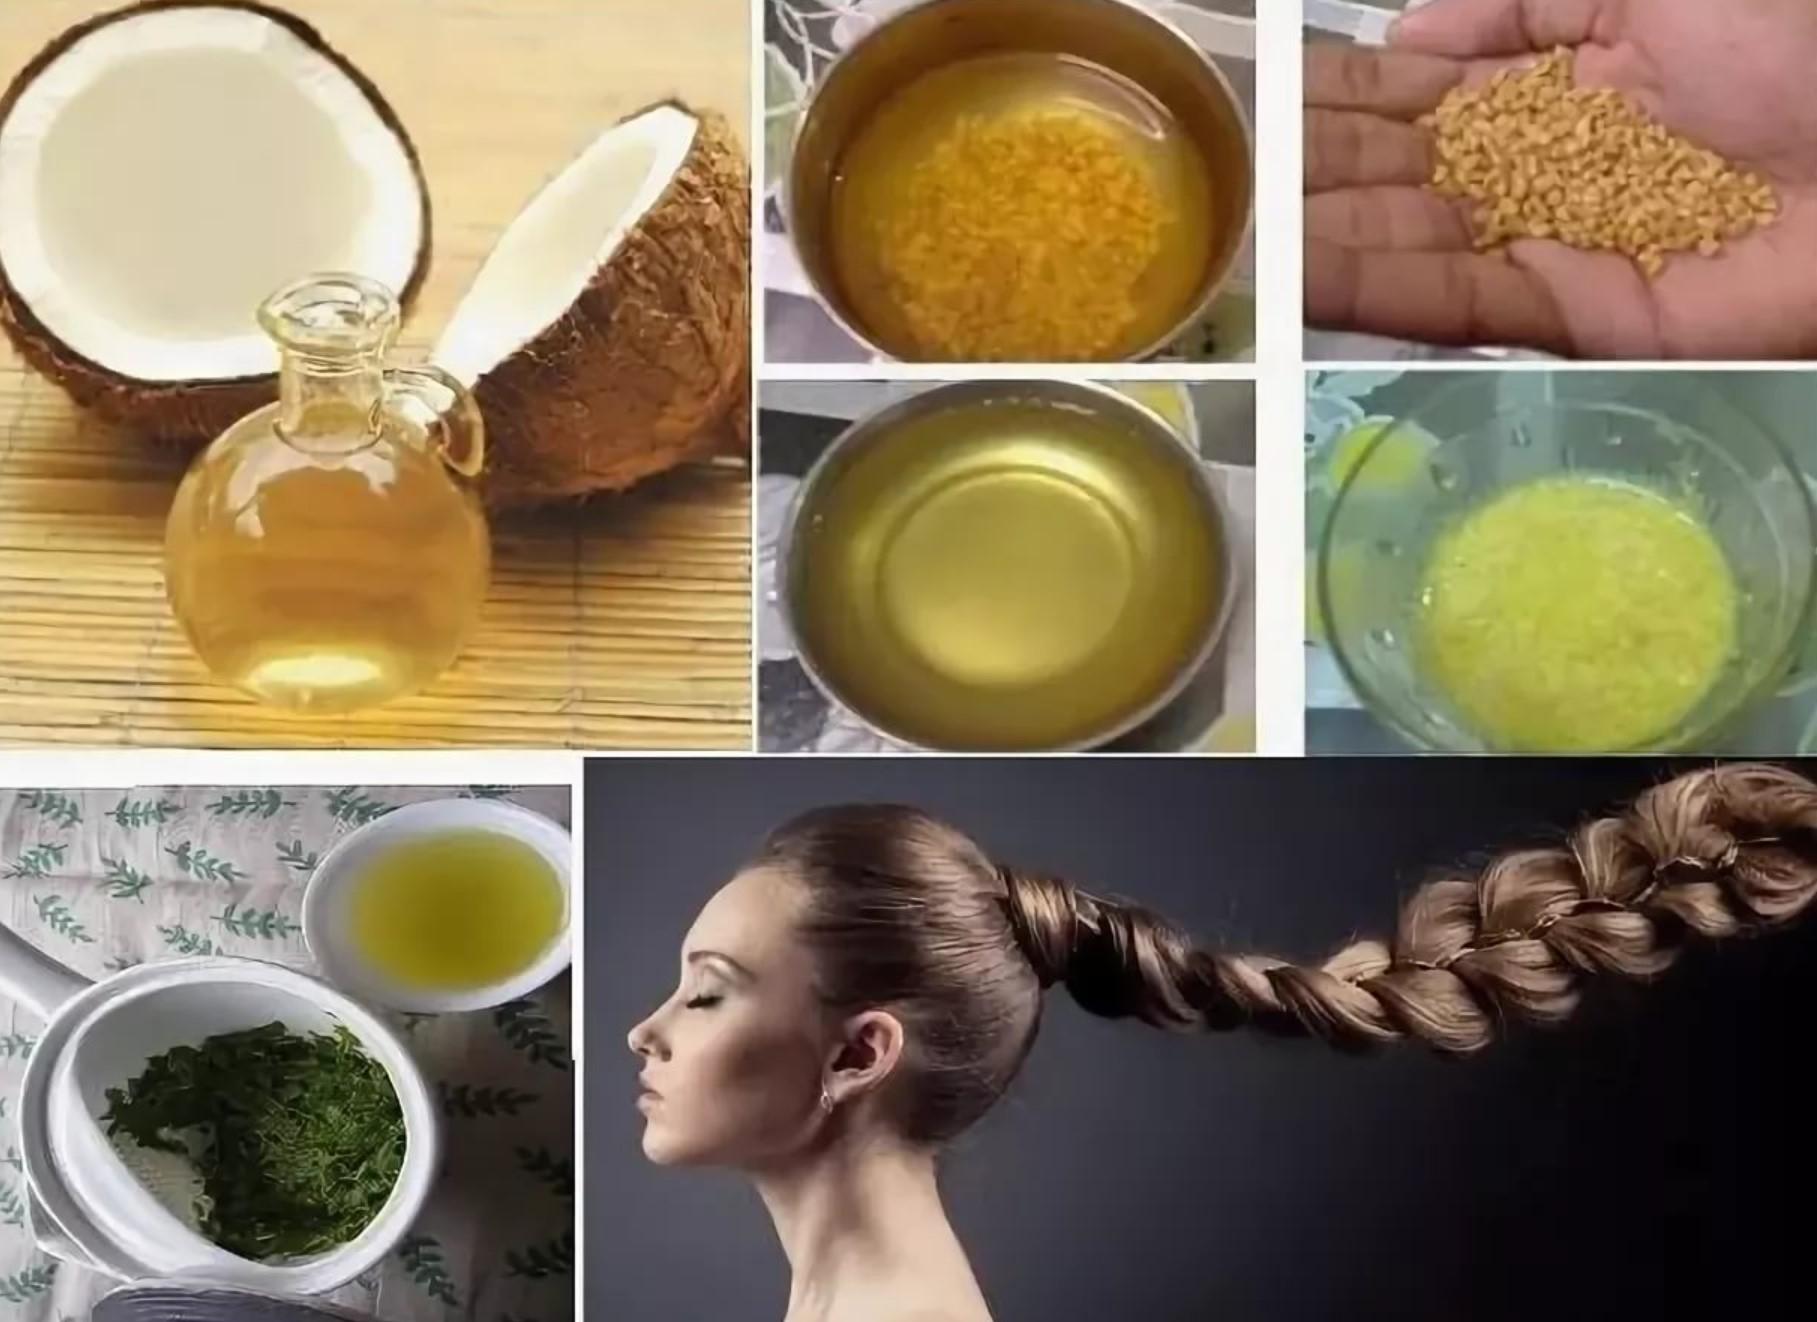 Уход за волосами народными средствами в домашних условиях